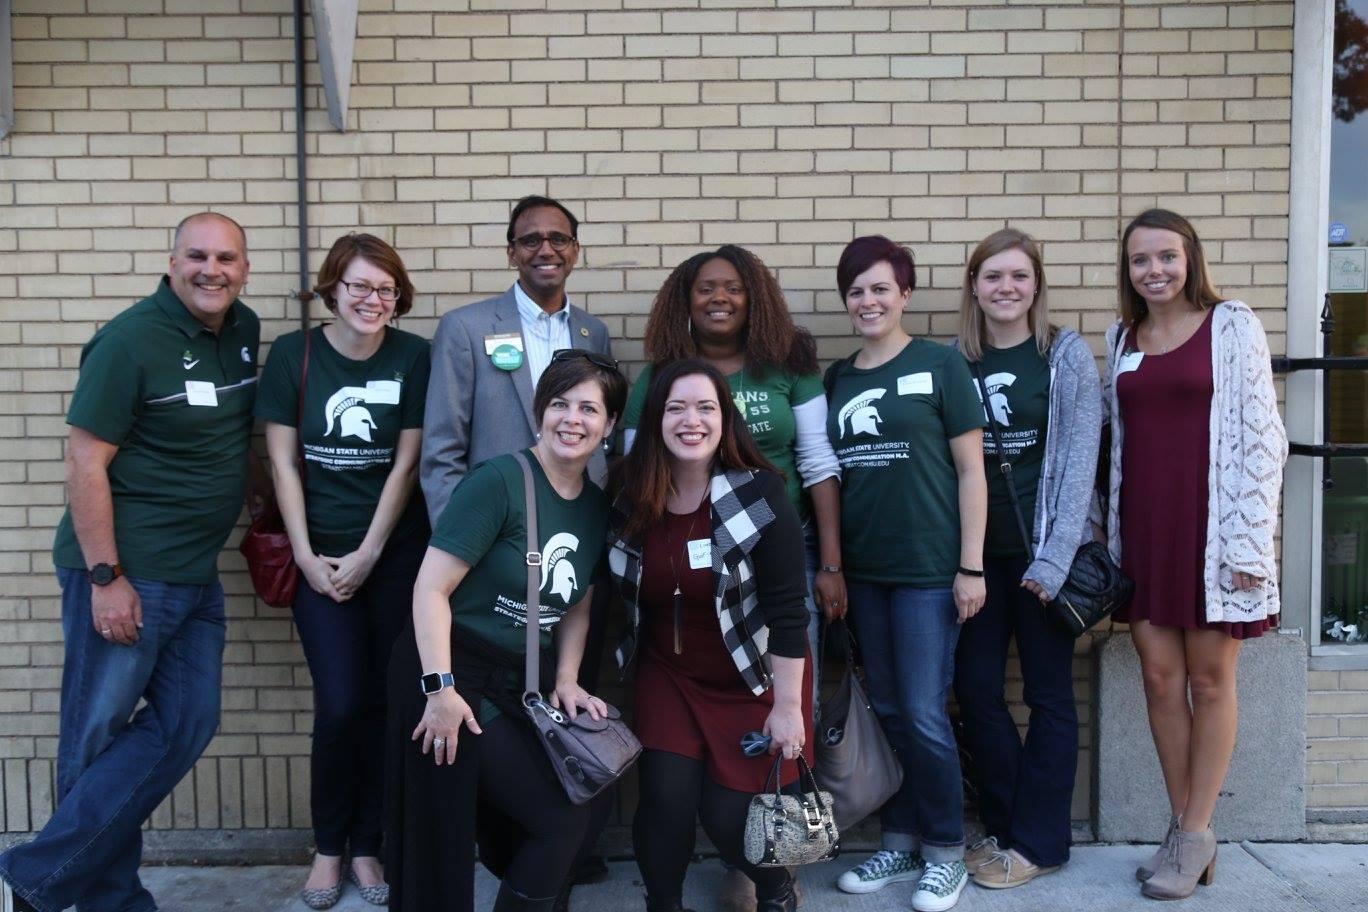 MSU StratCom Homecoming group photo